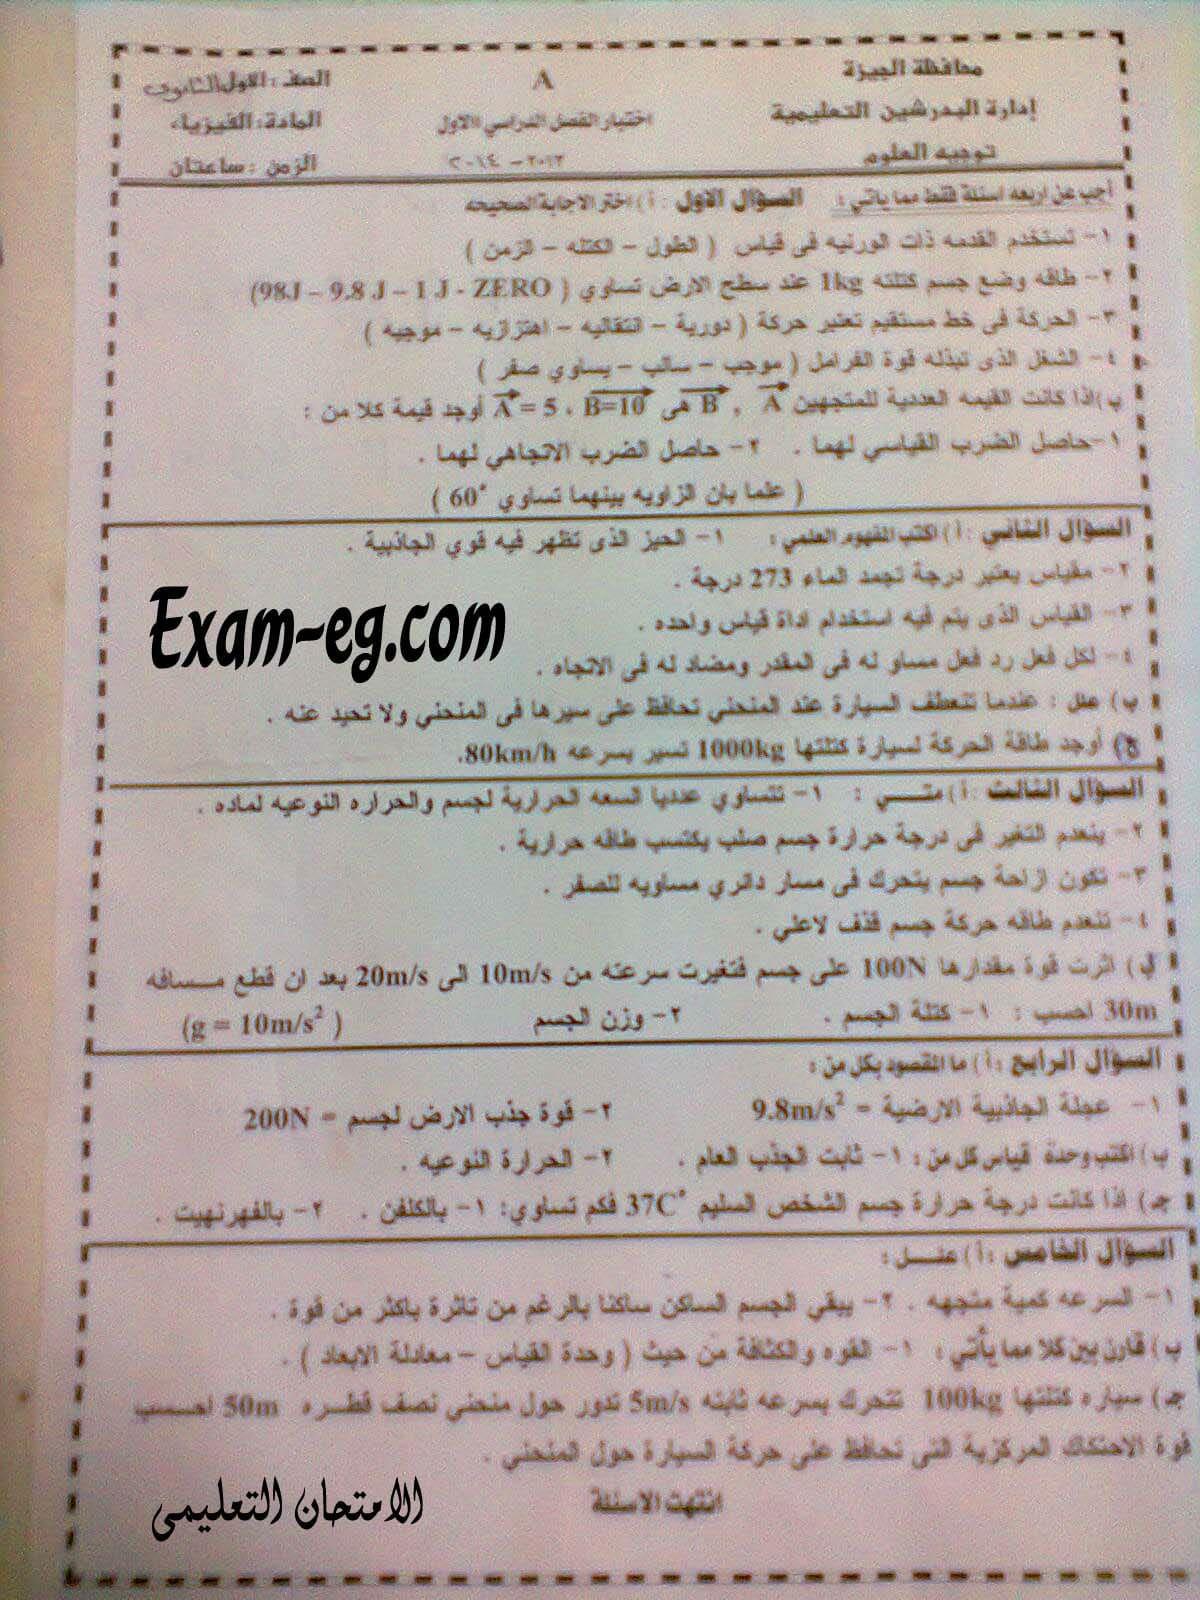 exam-eg.com_1392436217991.jpg